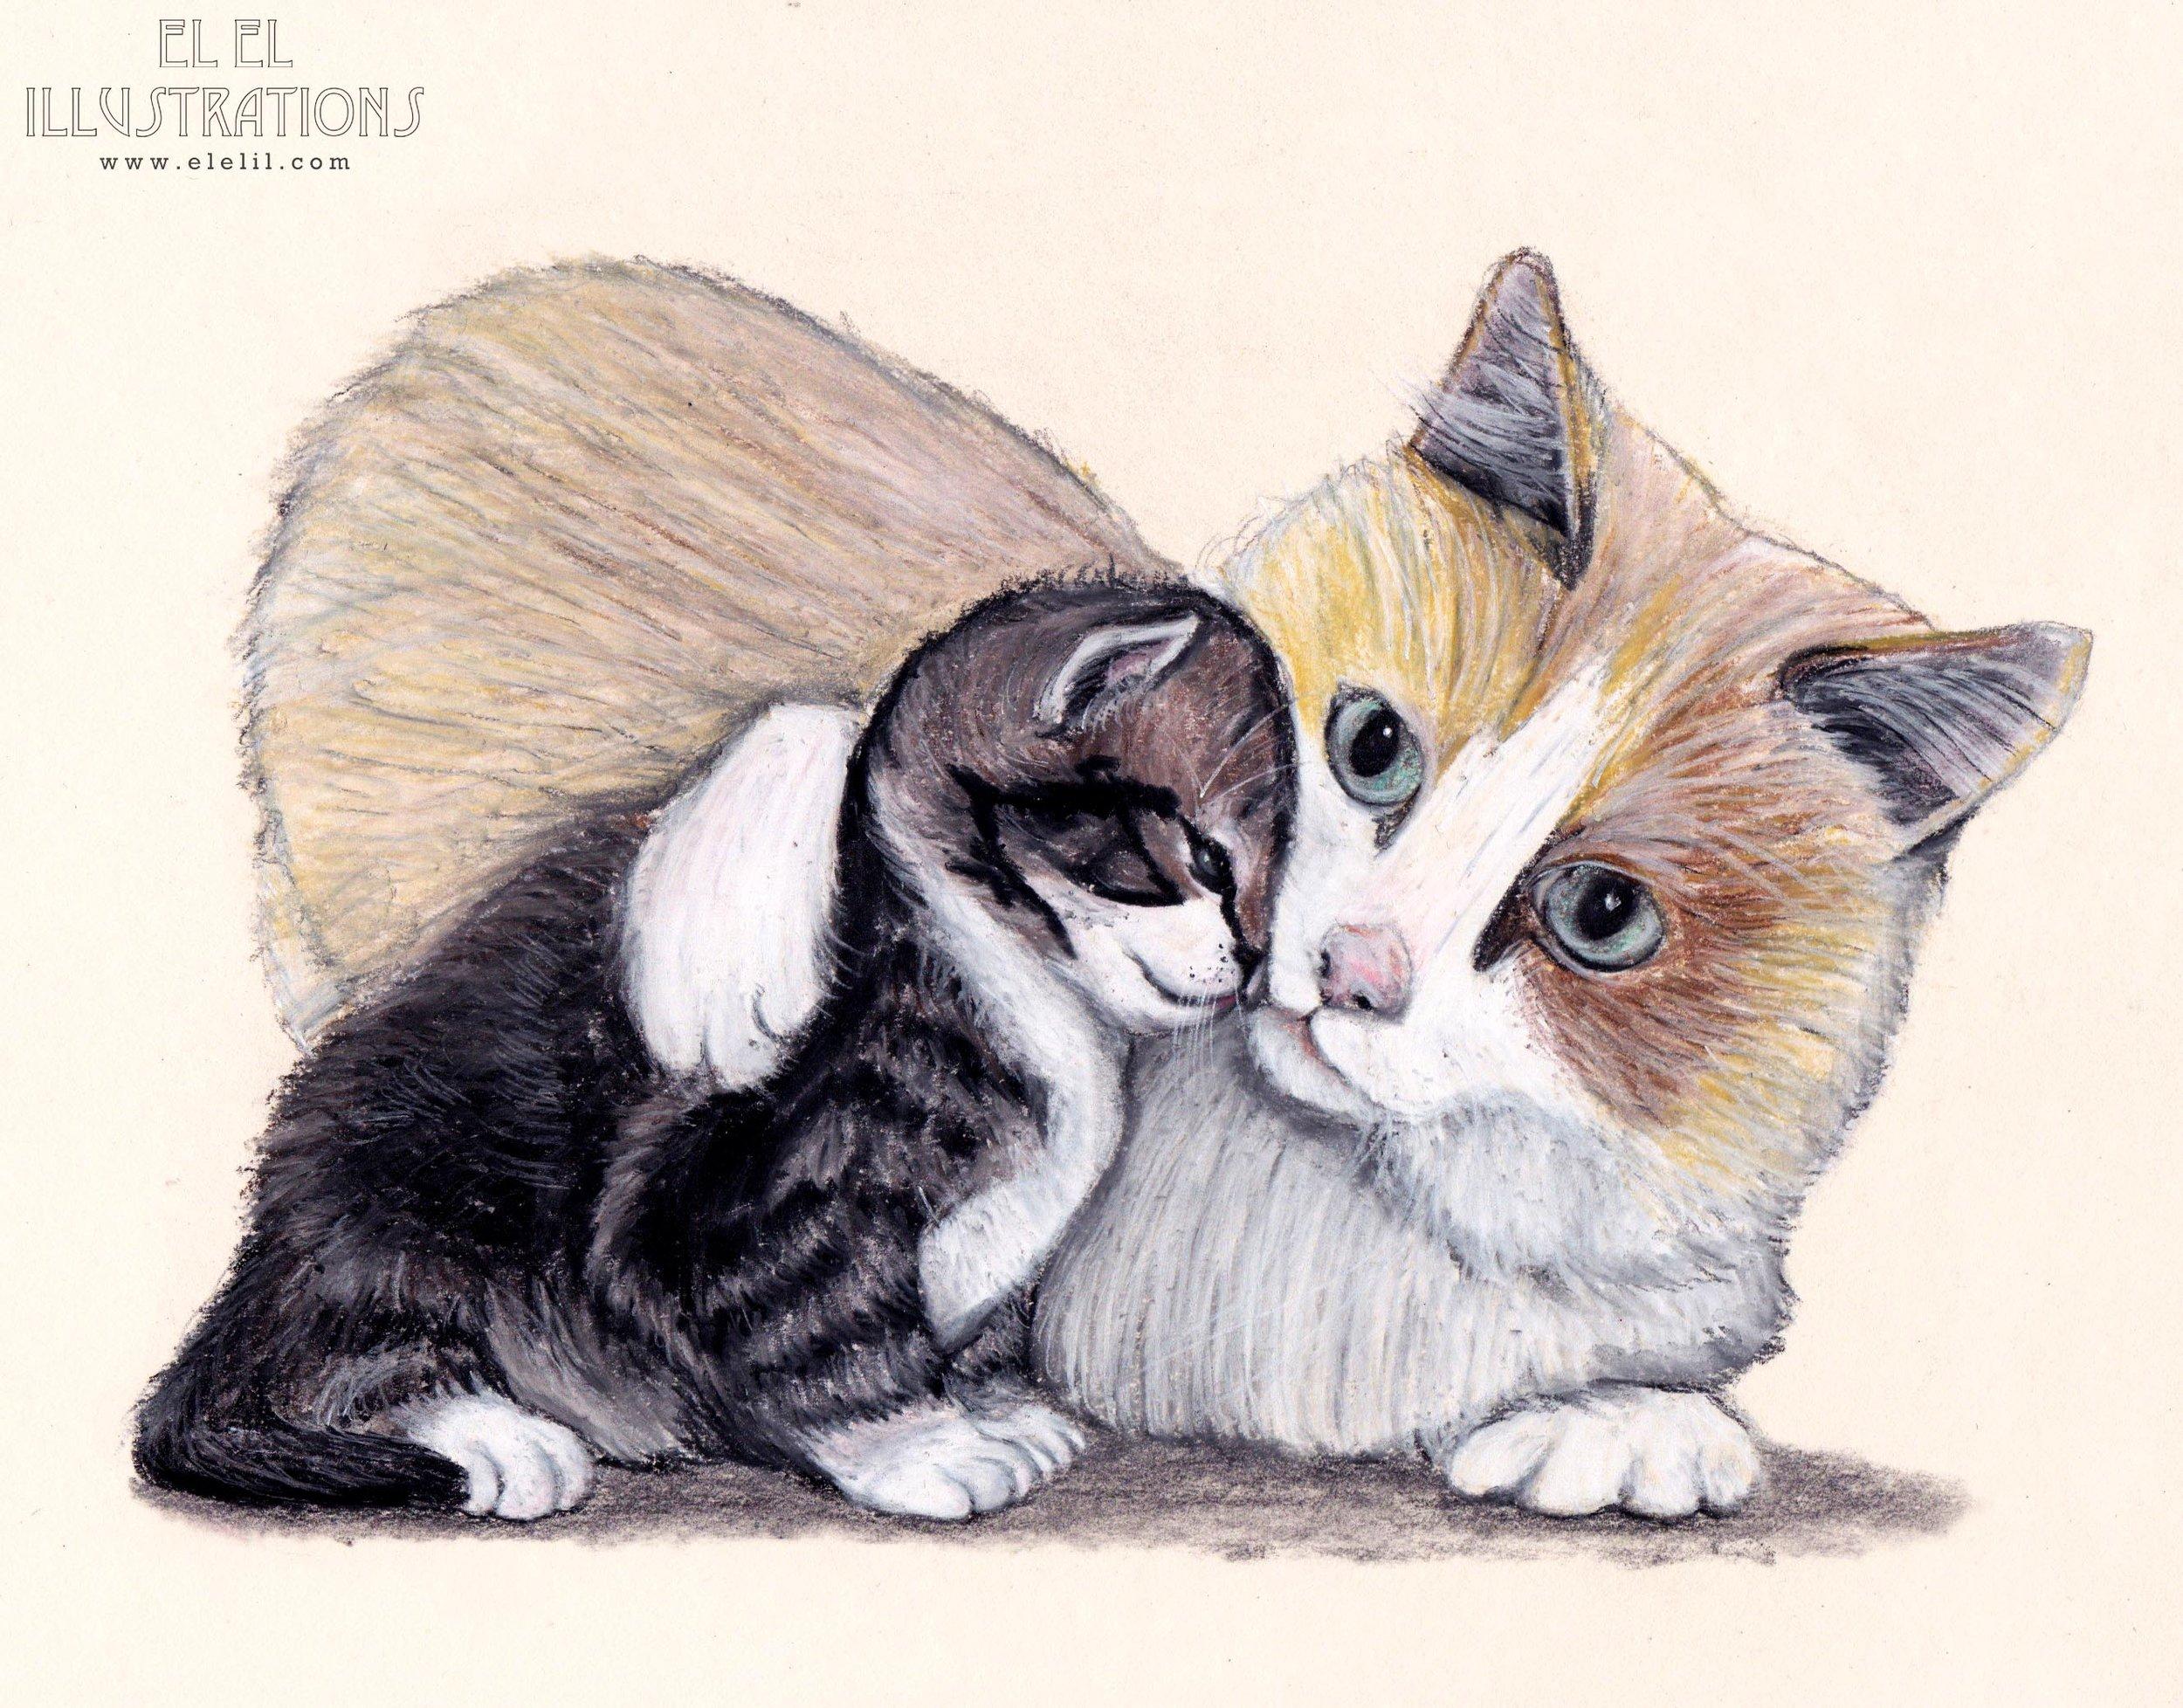 mothersday_cat_wm.jpg